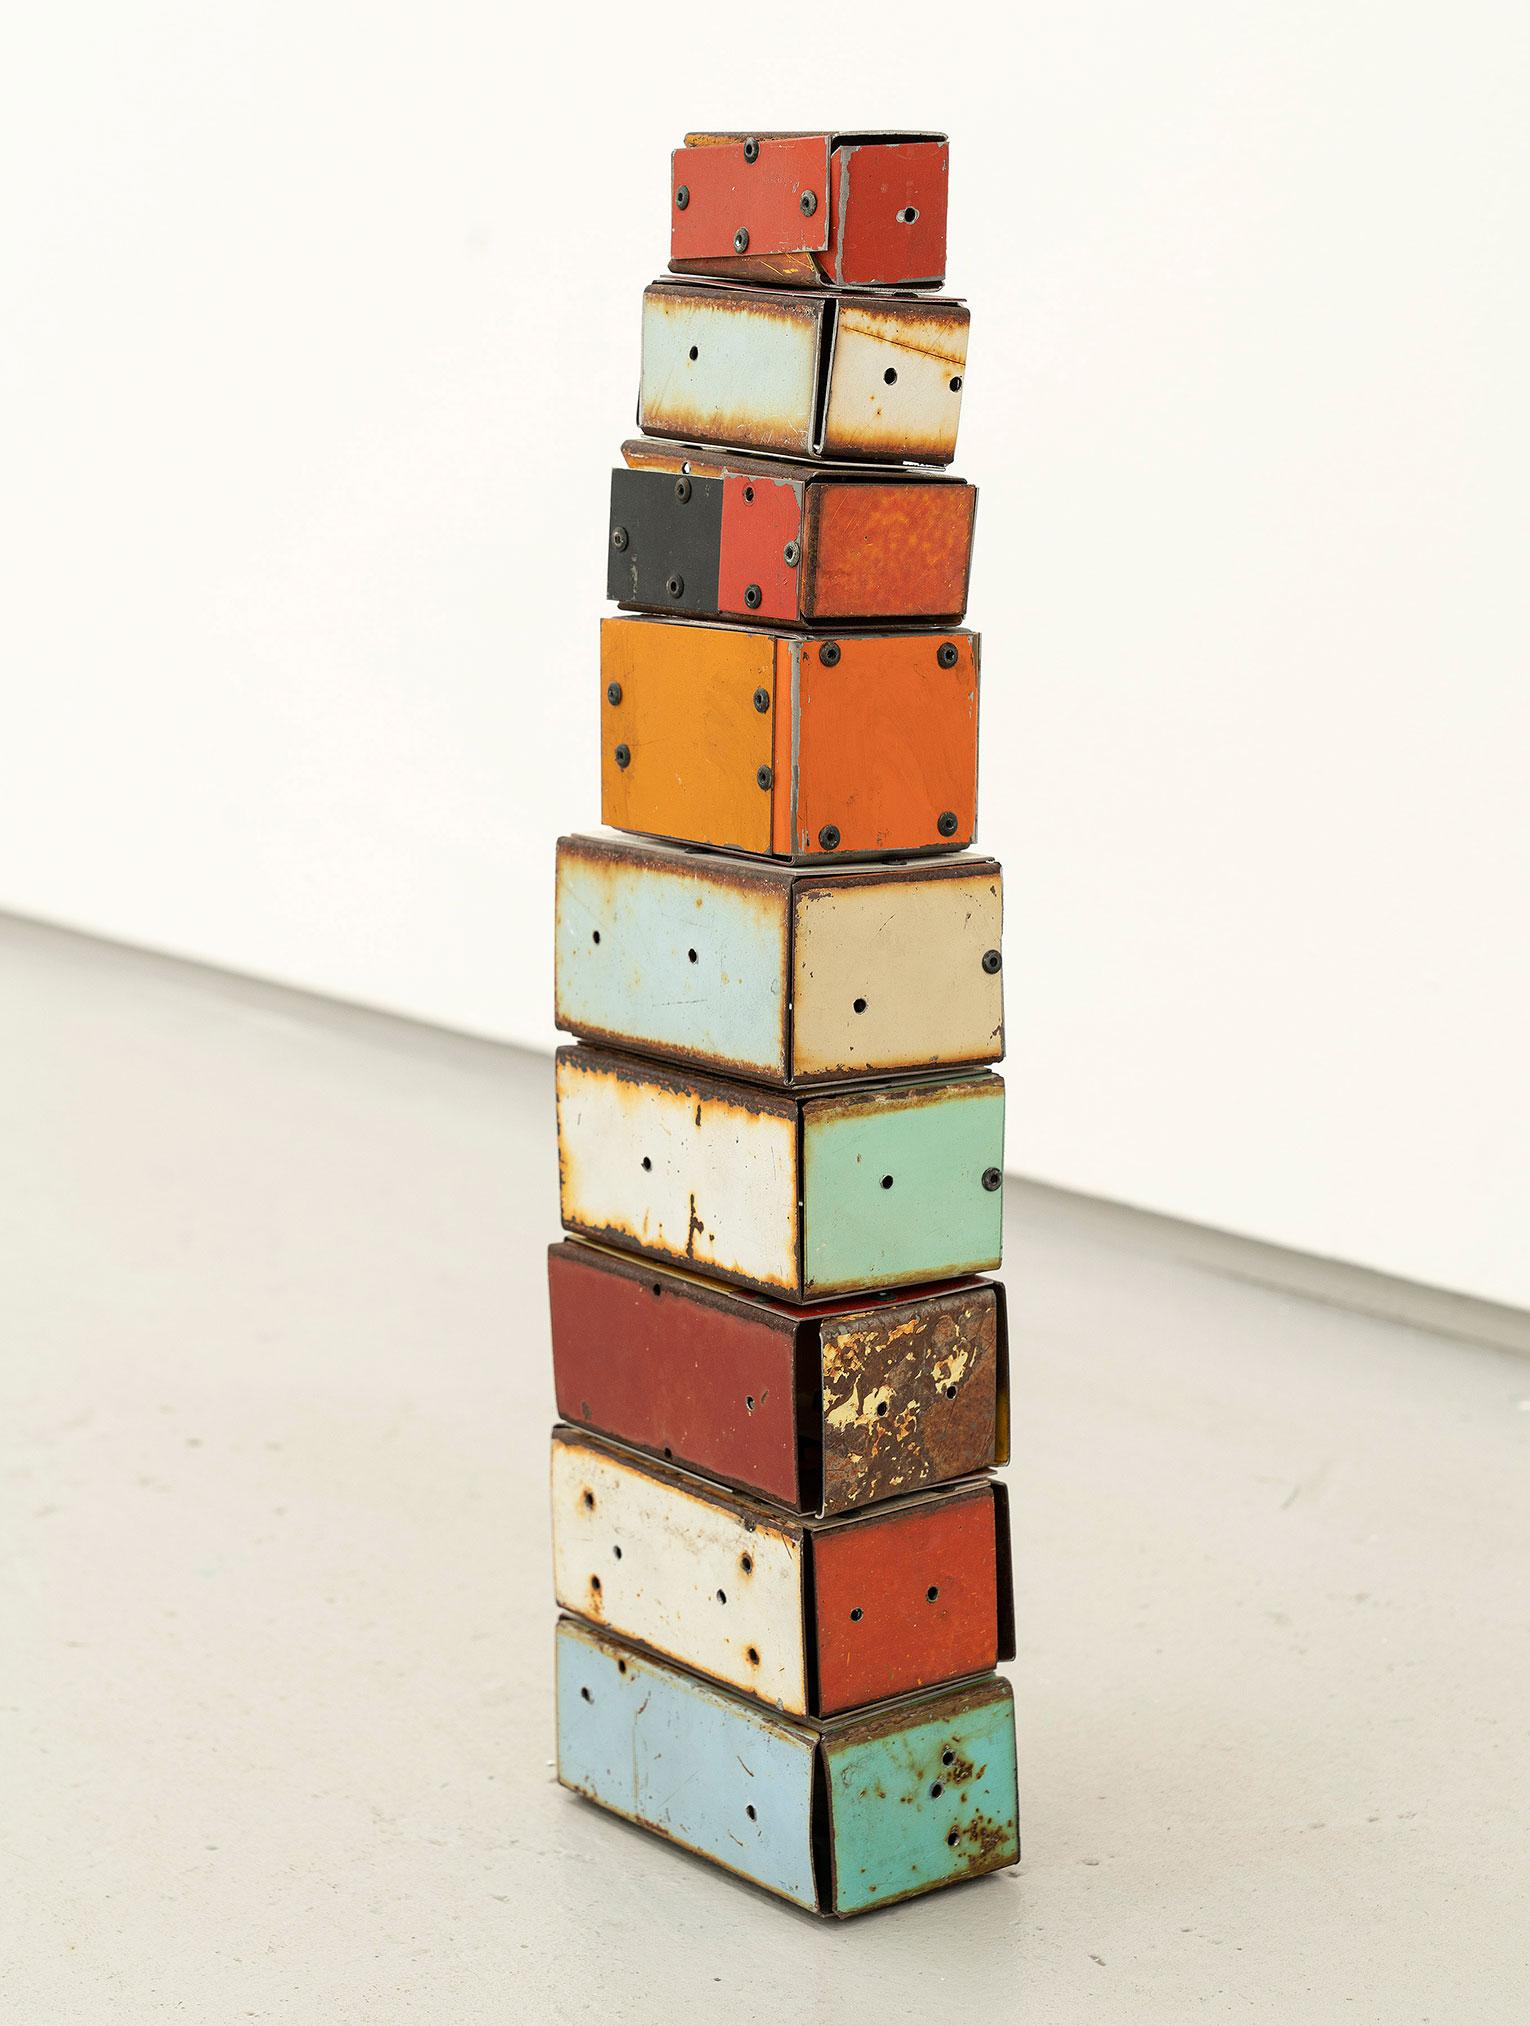 <b>Title:</b>Boxed Up<br /><b>Year:</b>2019<br /><b>Medium:</b>Salvage steel, rivets, welded plinth<br /><b>Size:</b>46 x 15 x 7 cm